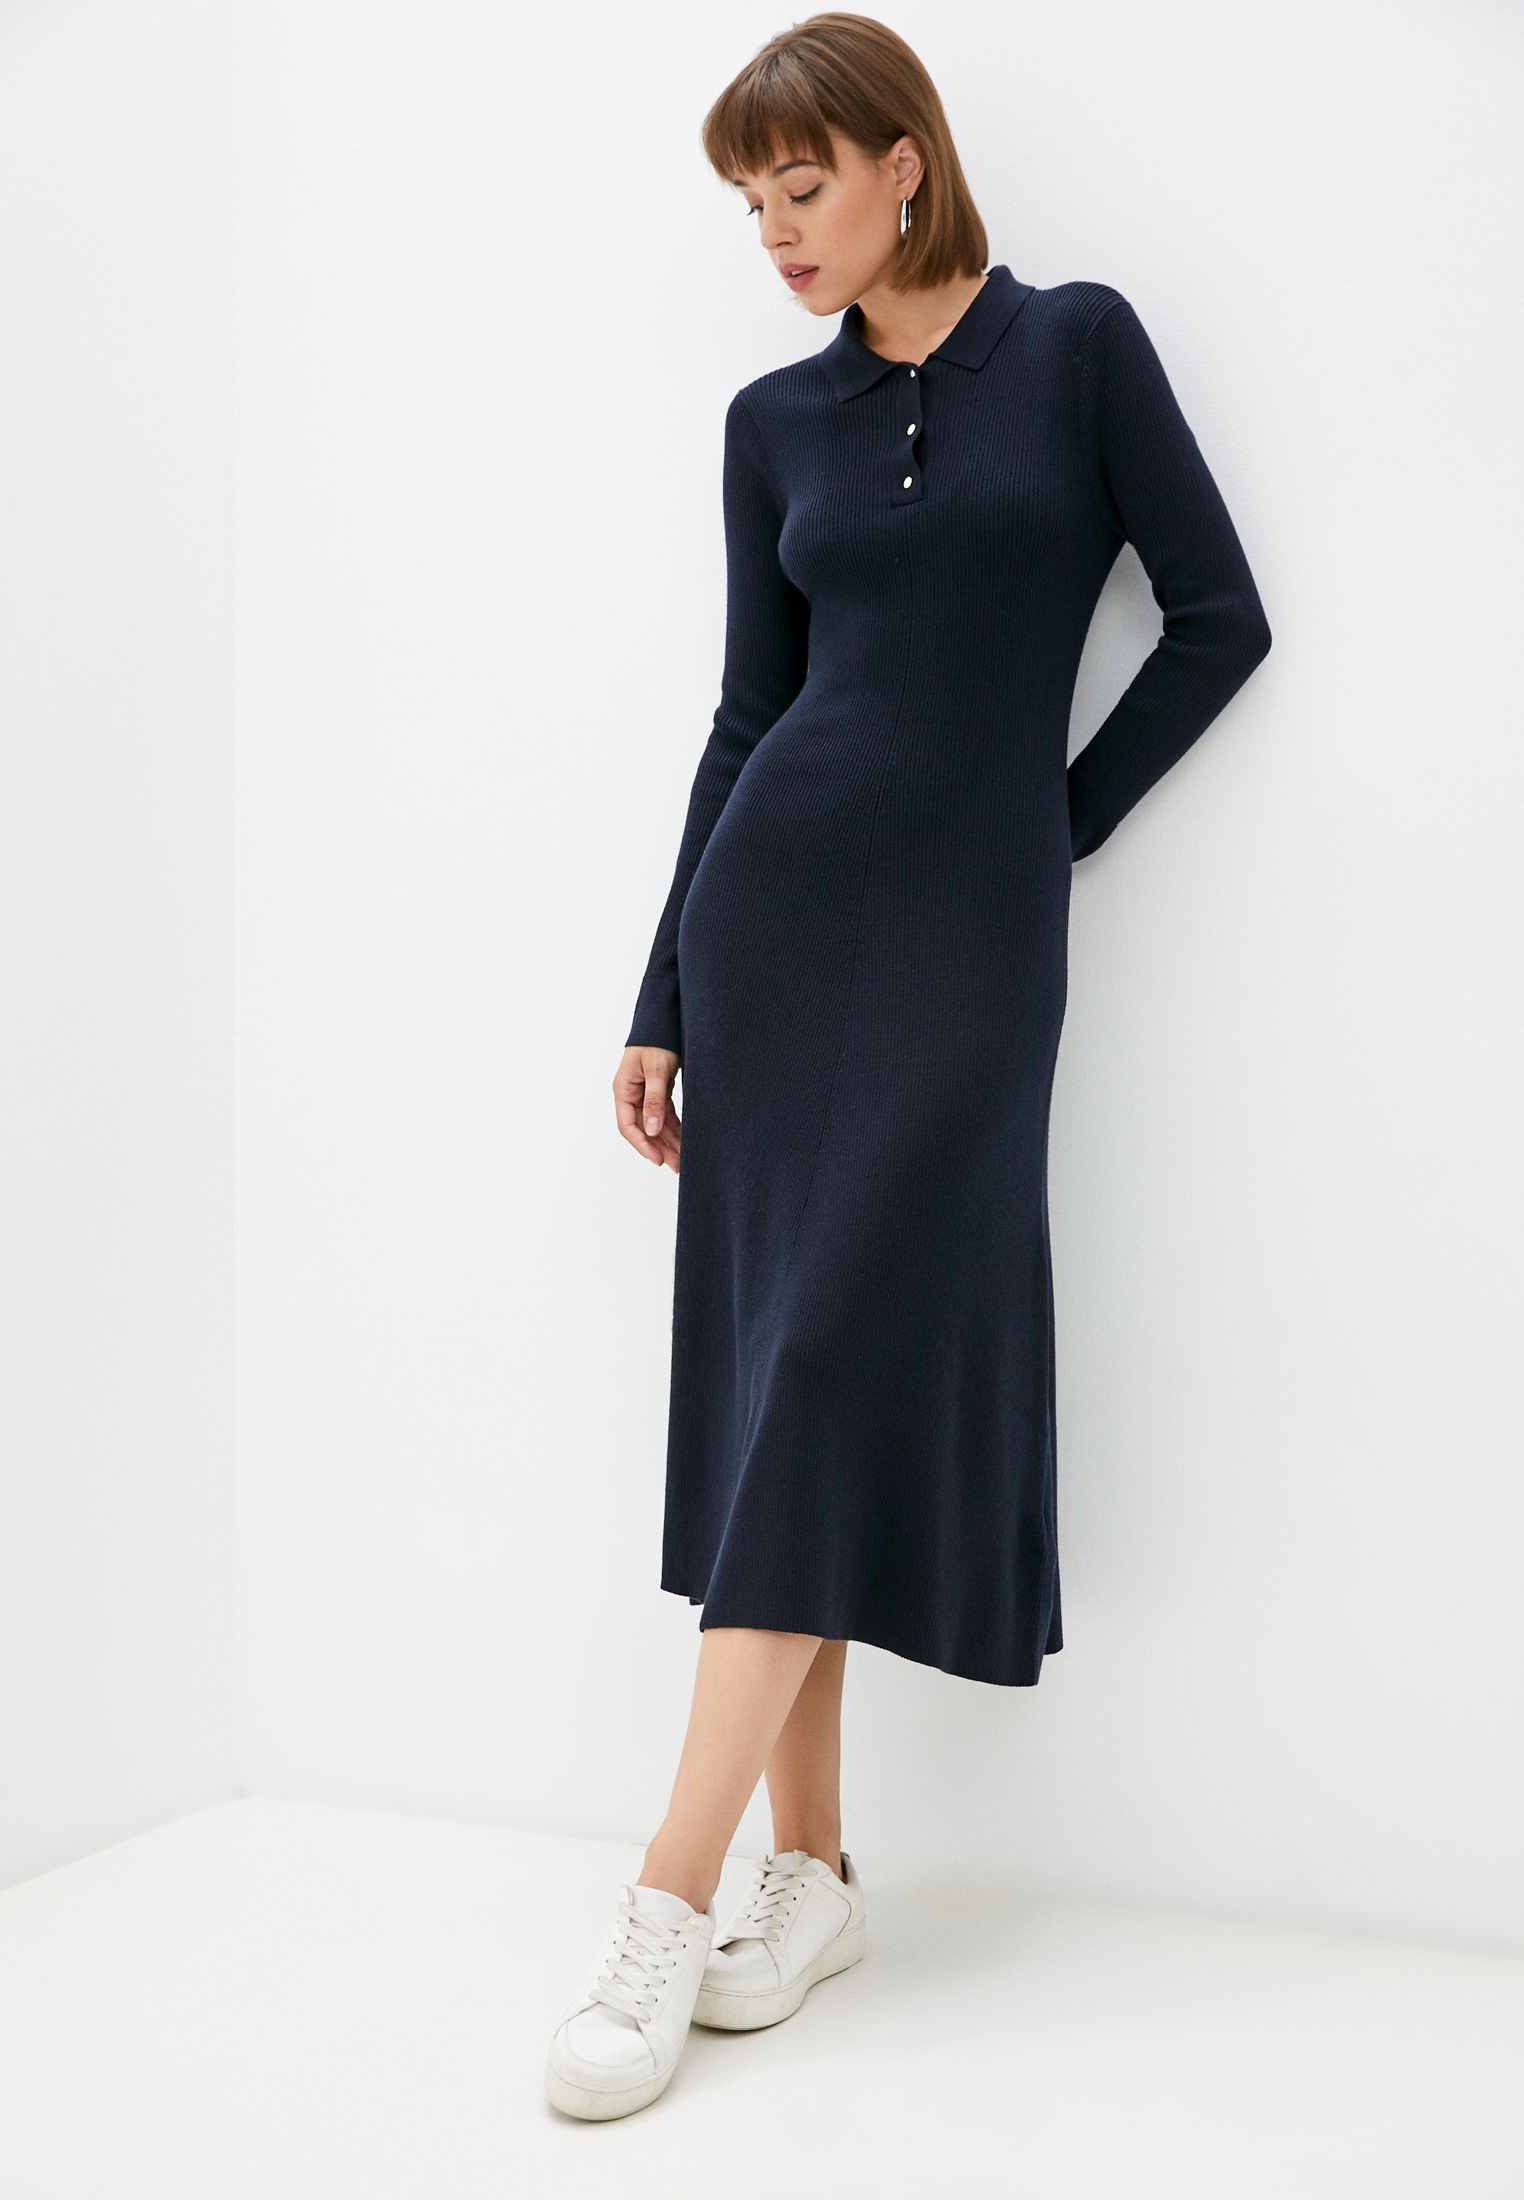 Вязаное платье Tommy Hilfiger (Томми Хилфигер) WW0WW29426